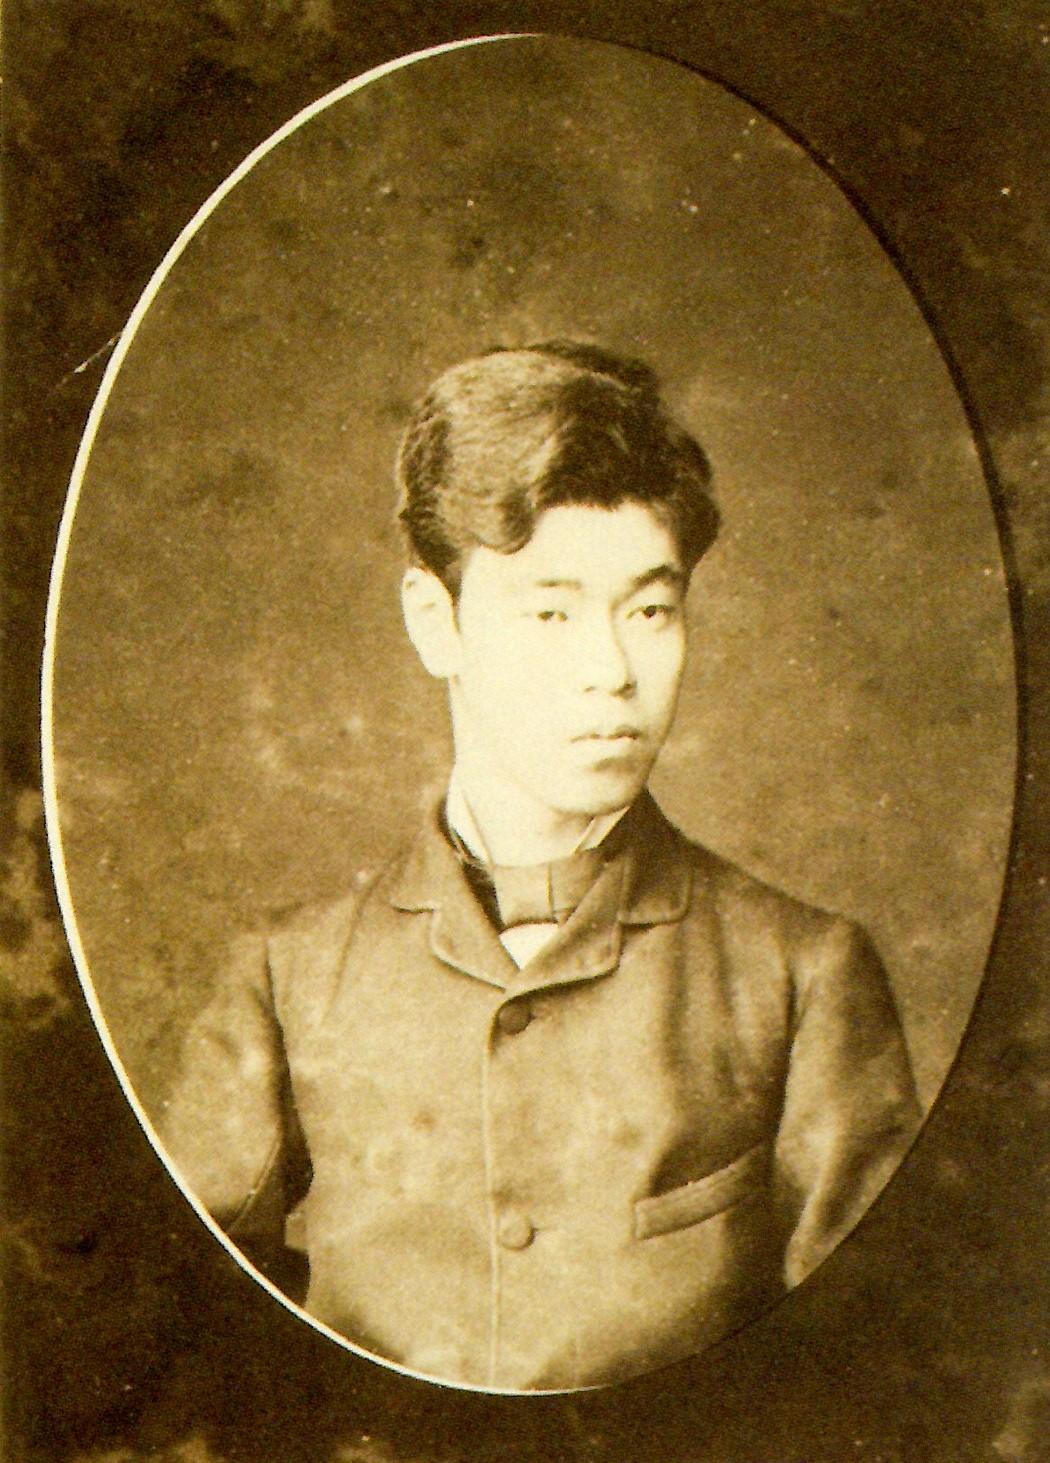 Image of Kamei Koreaki from Wikidata